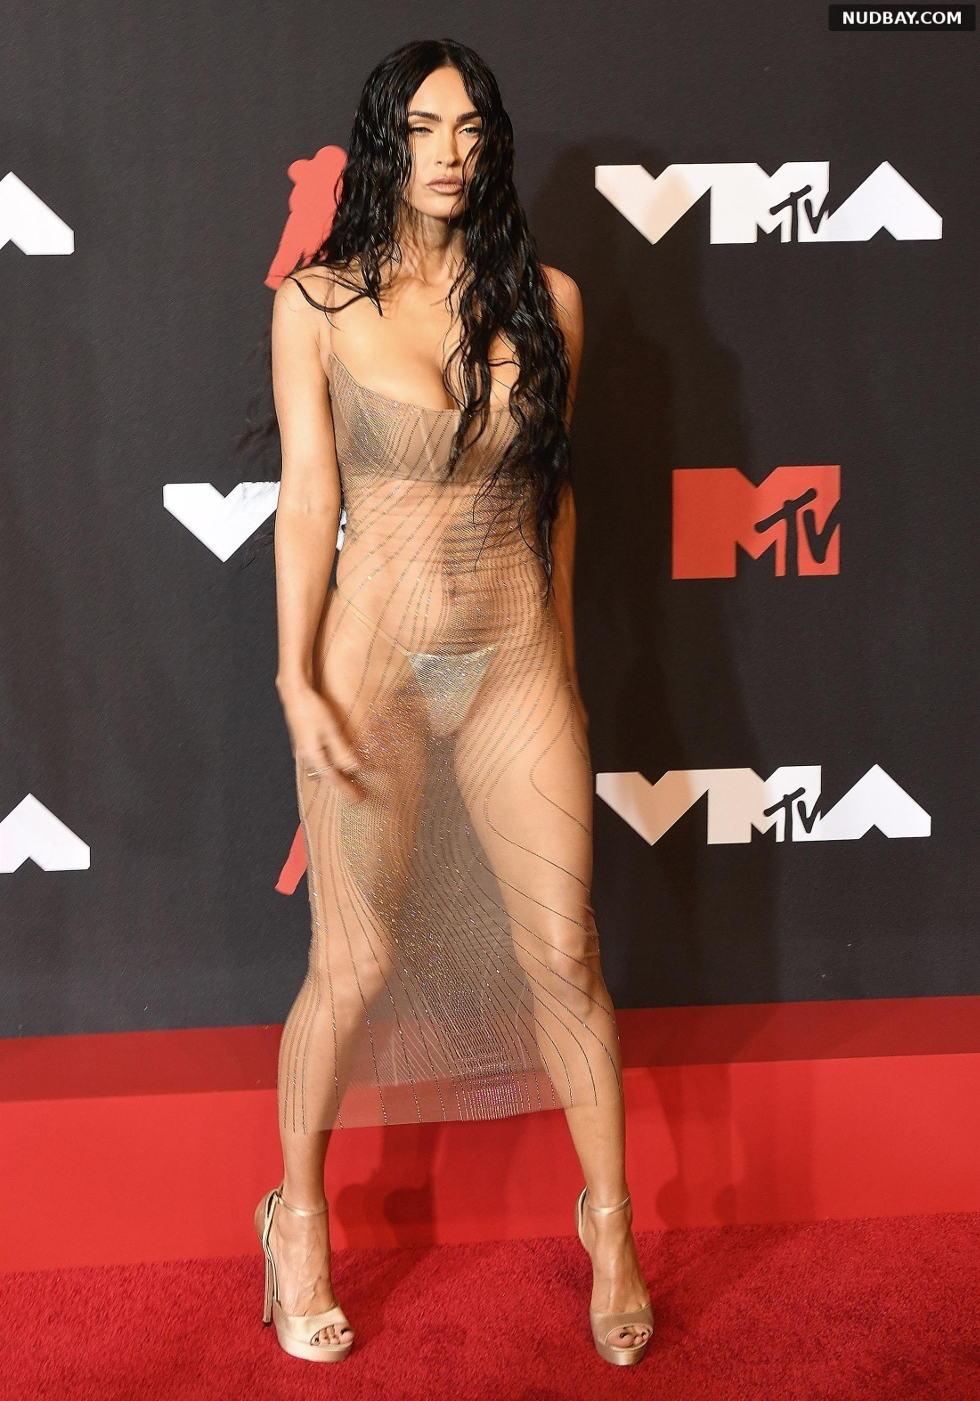 Megan Fox nude at MTV Video Music Awards in New York Sep 12 2021